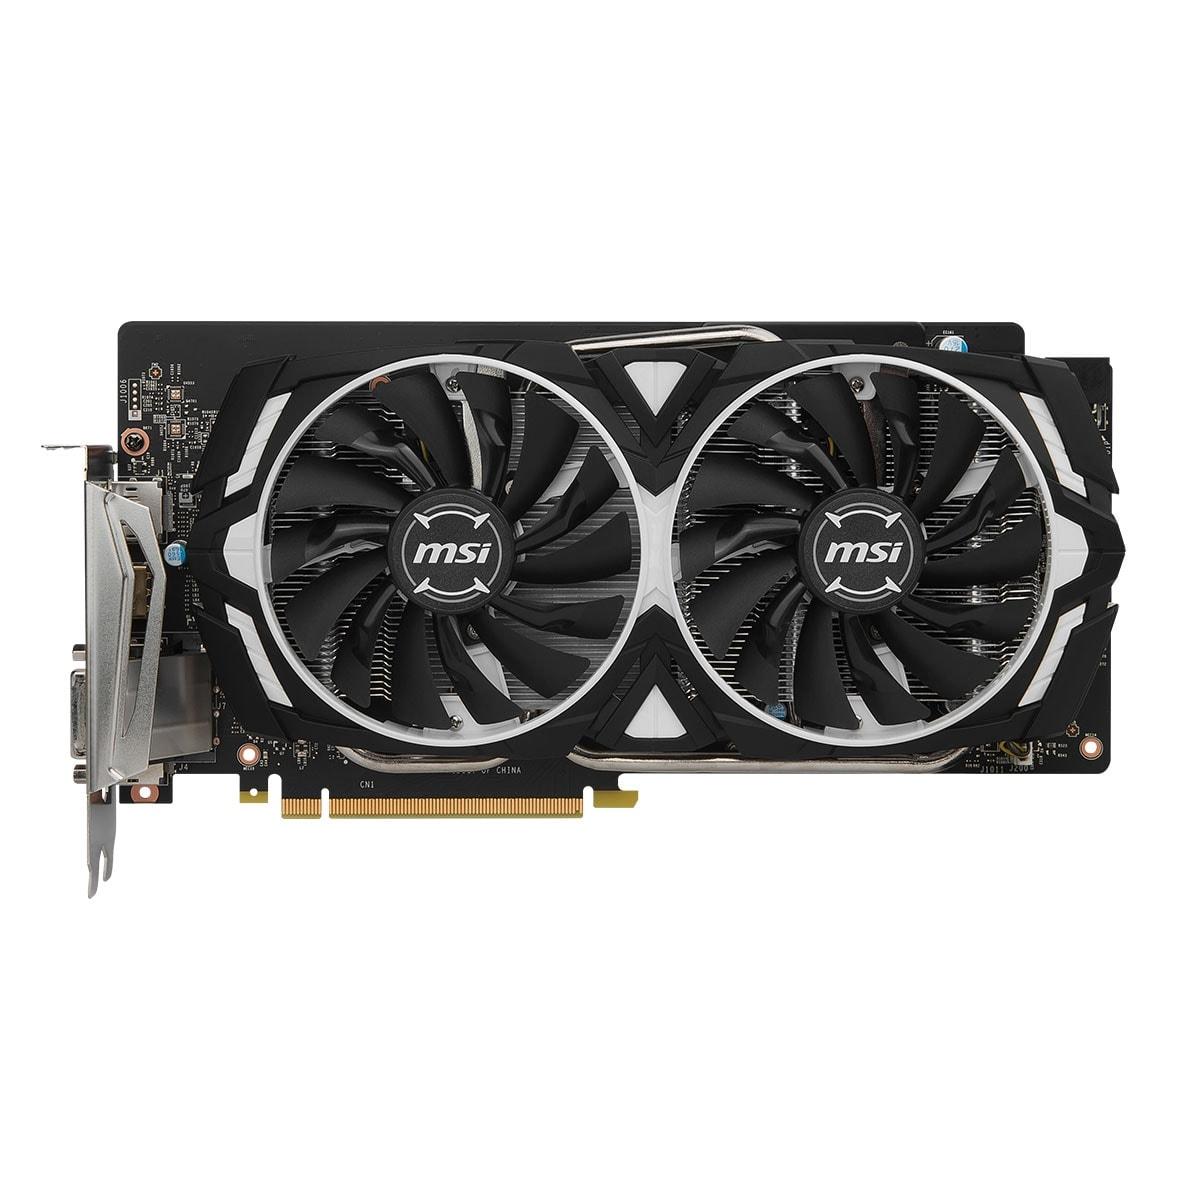 MSI GeForce GTX 1060 ARMOR 6G OCV1  (912-V328-028) - Achat / Vente Carte Graphique sur Cybertek.fr - 3